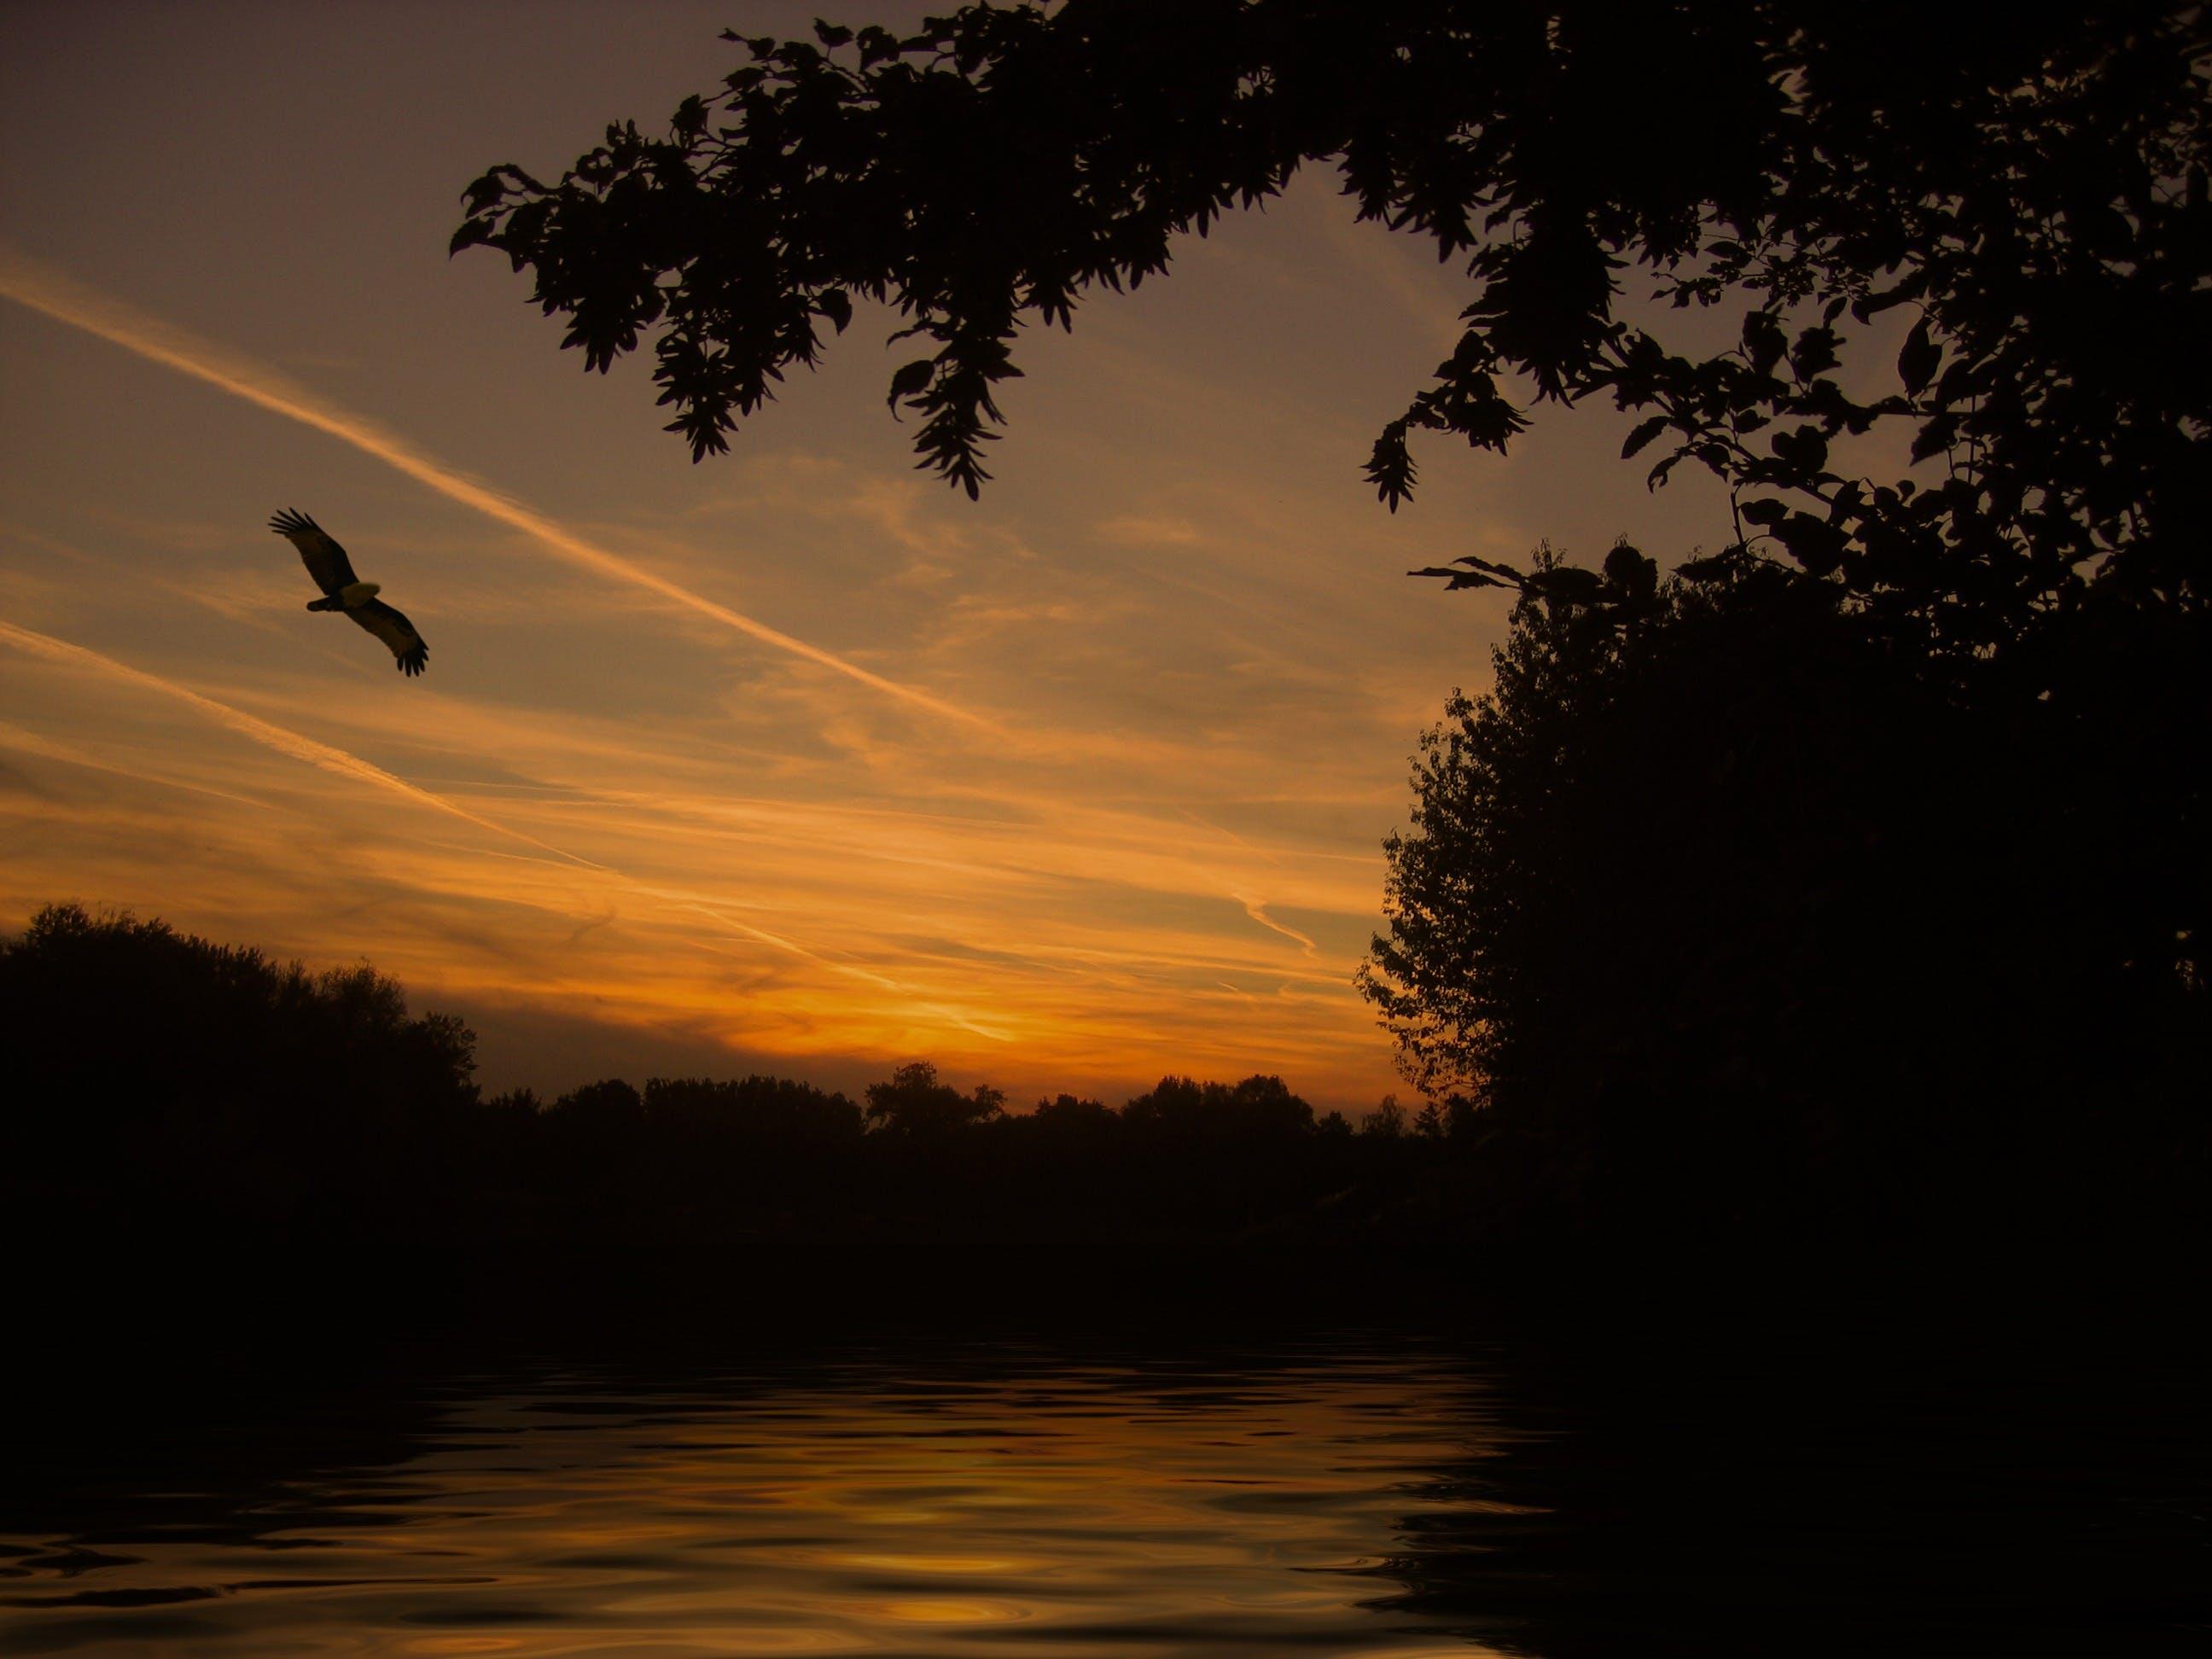 Free stock photo of sky, sunset, bird, water